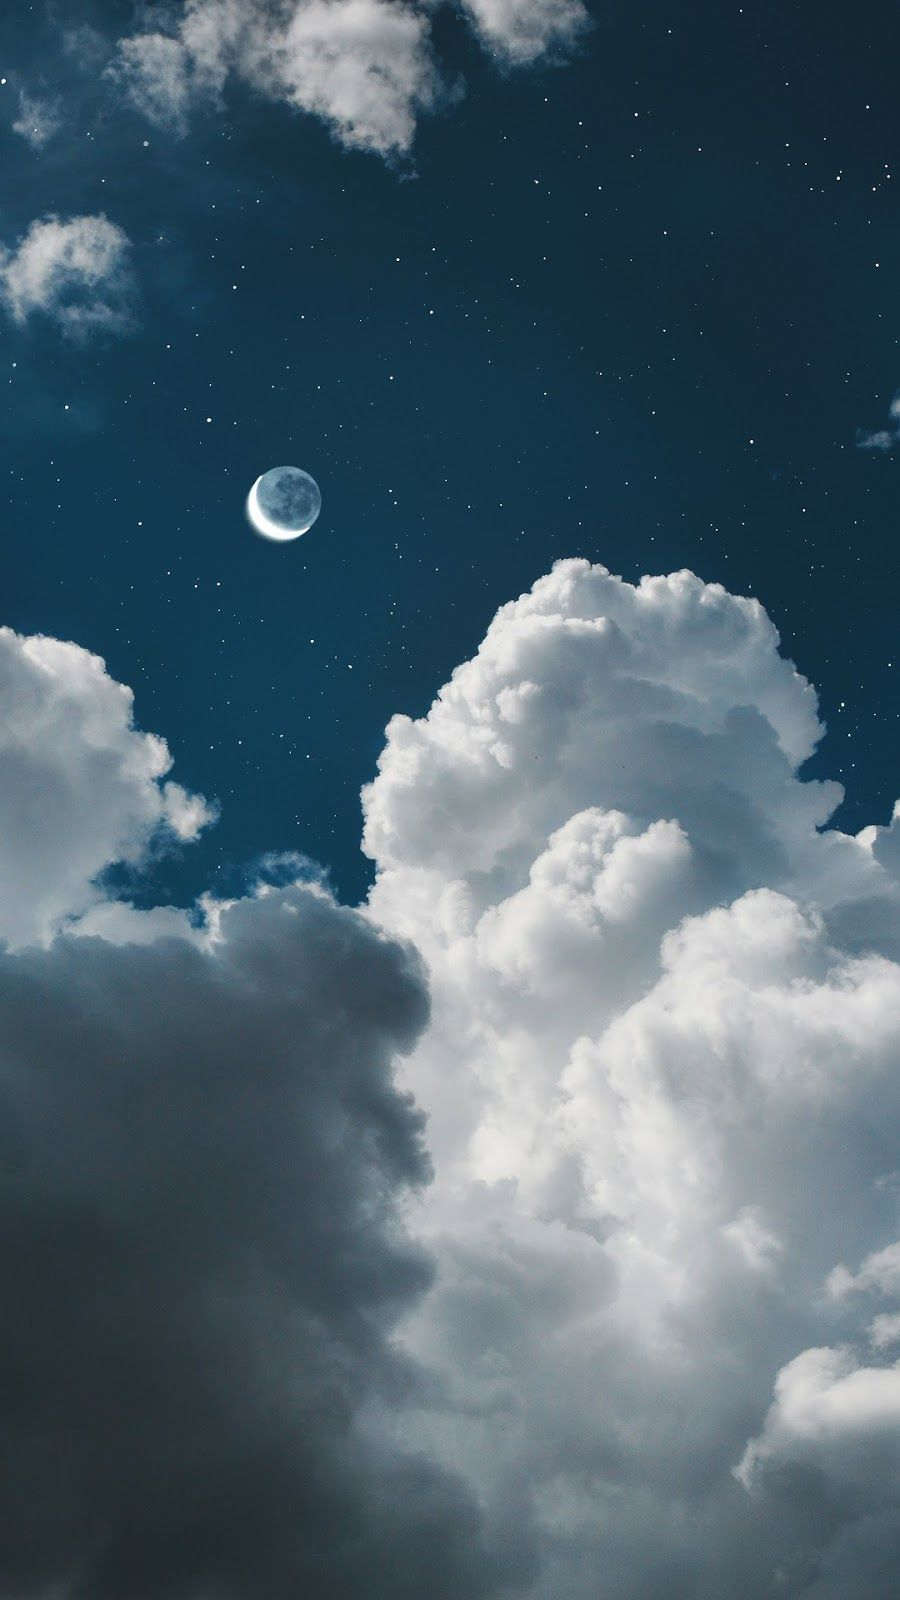 Two moon #iphonewallpaper